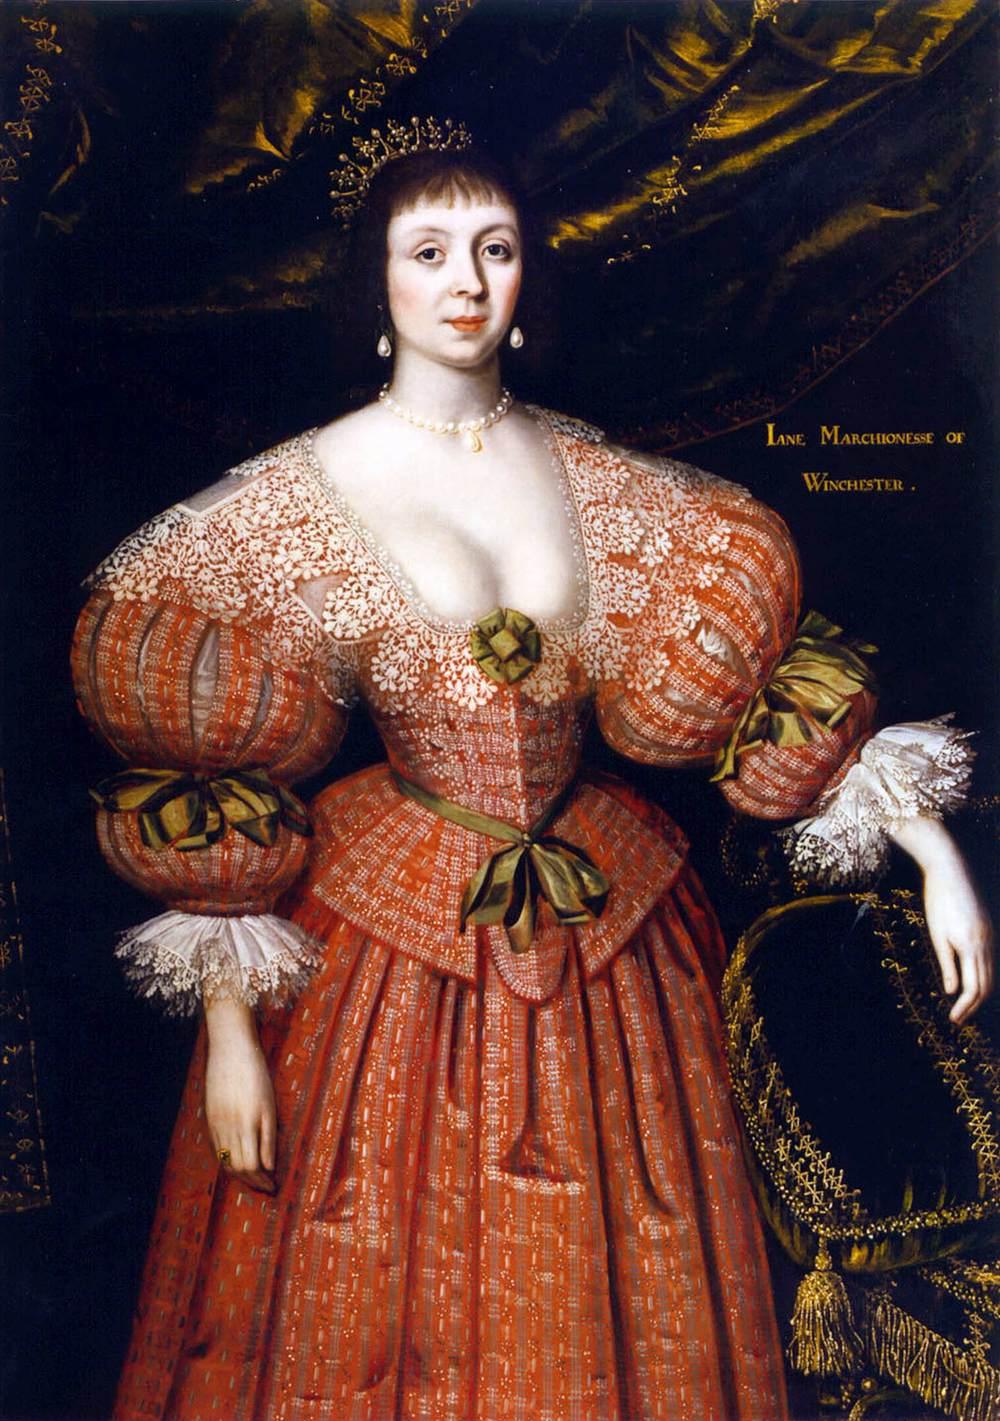 Portrait of Jane, Countess of Winchester :: Jackson, Gilbert - 3 women portraits 17th century hall ôîòî